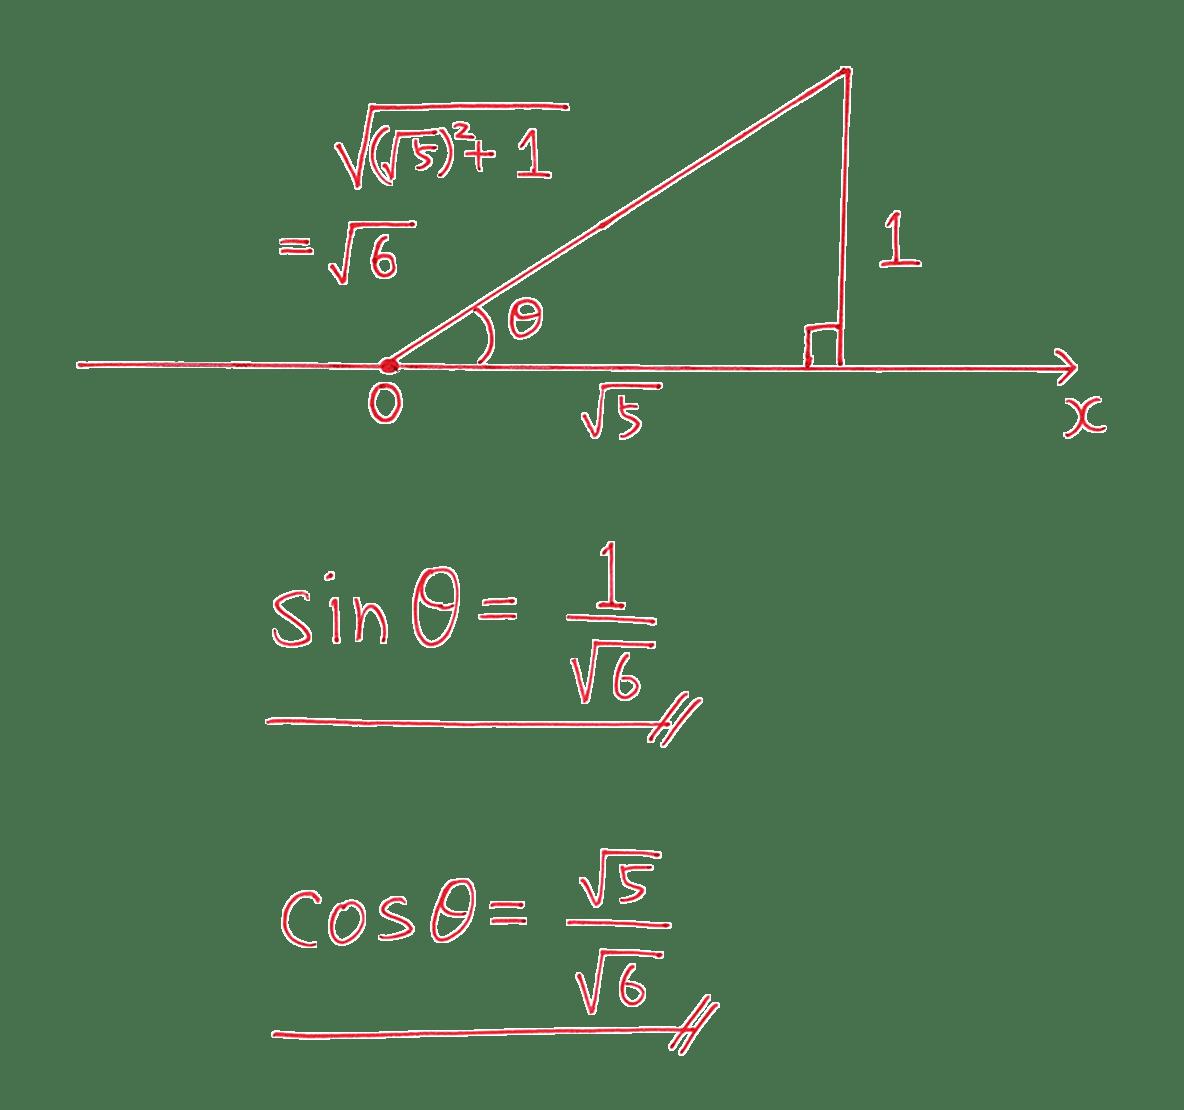 高校数学Ⅰ 三角比17 練習の答え